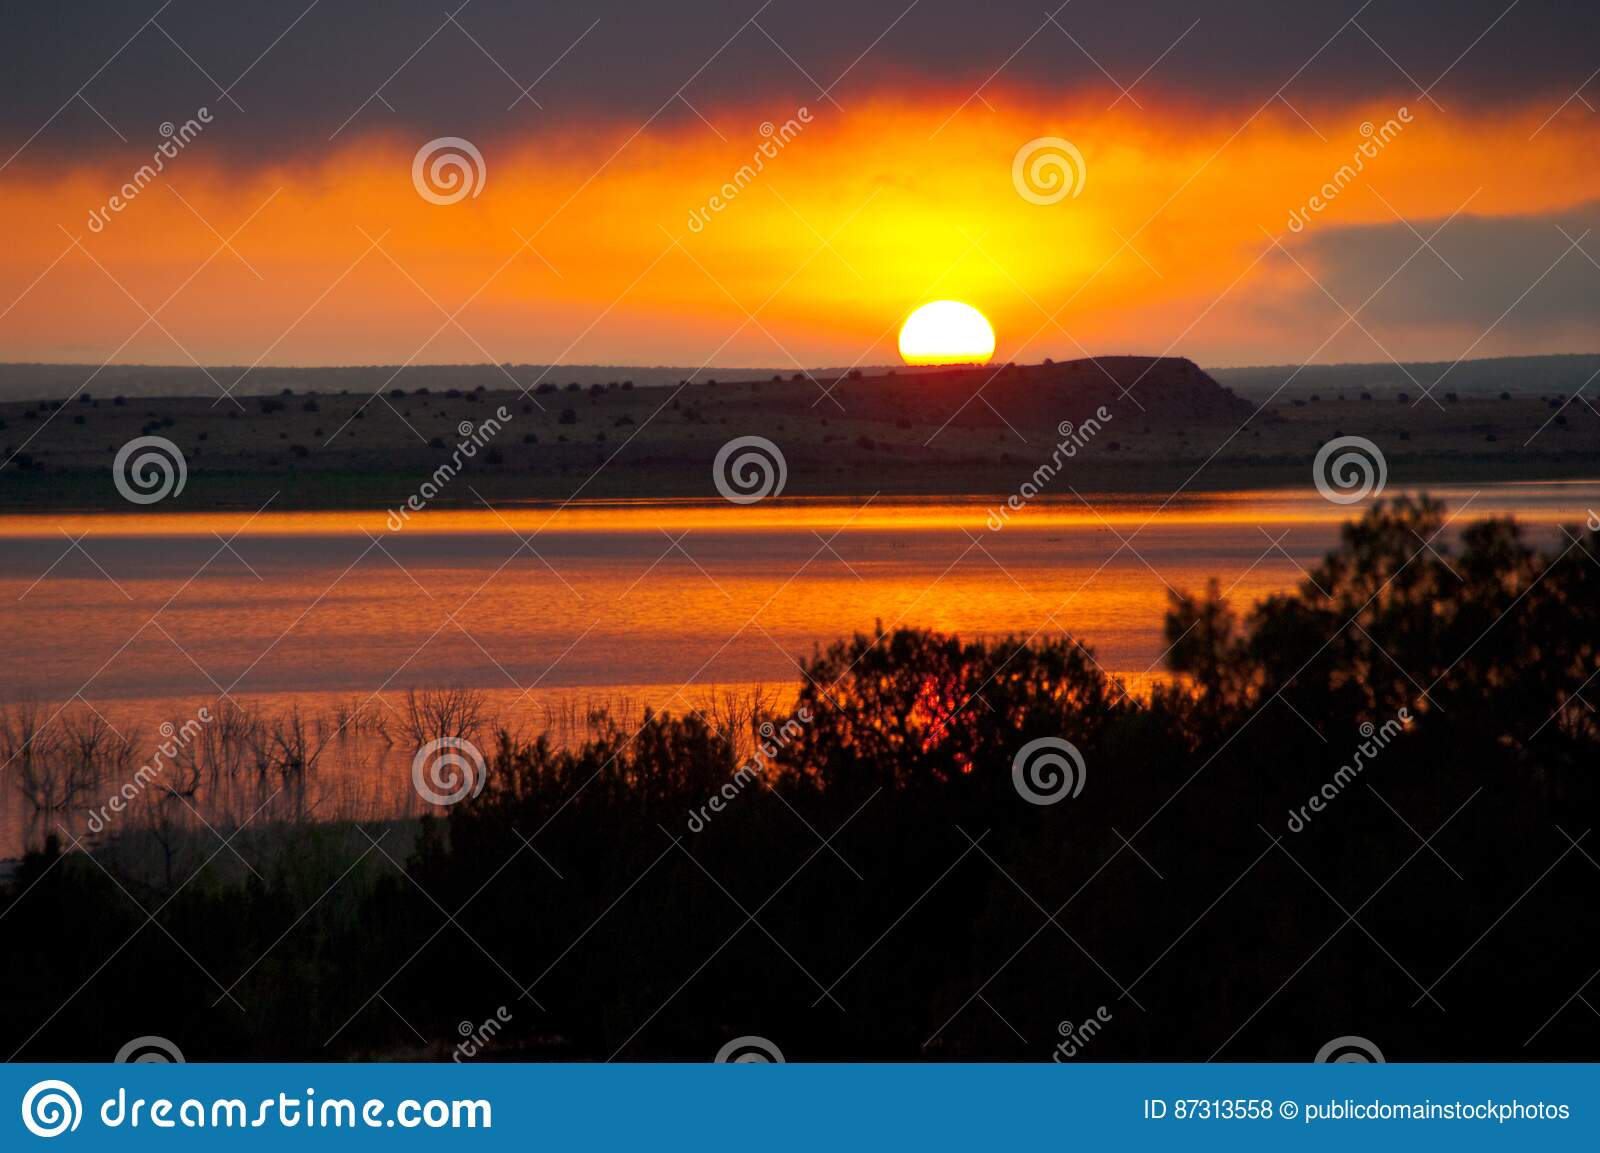 Road Trip Santa Rosa Lake Stock Photo Image Of Sunrise 87313558